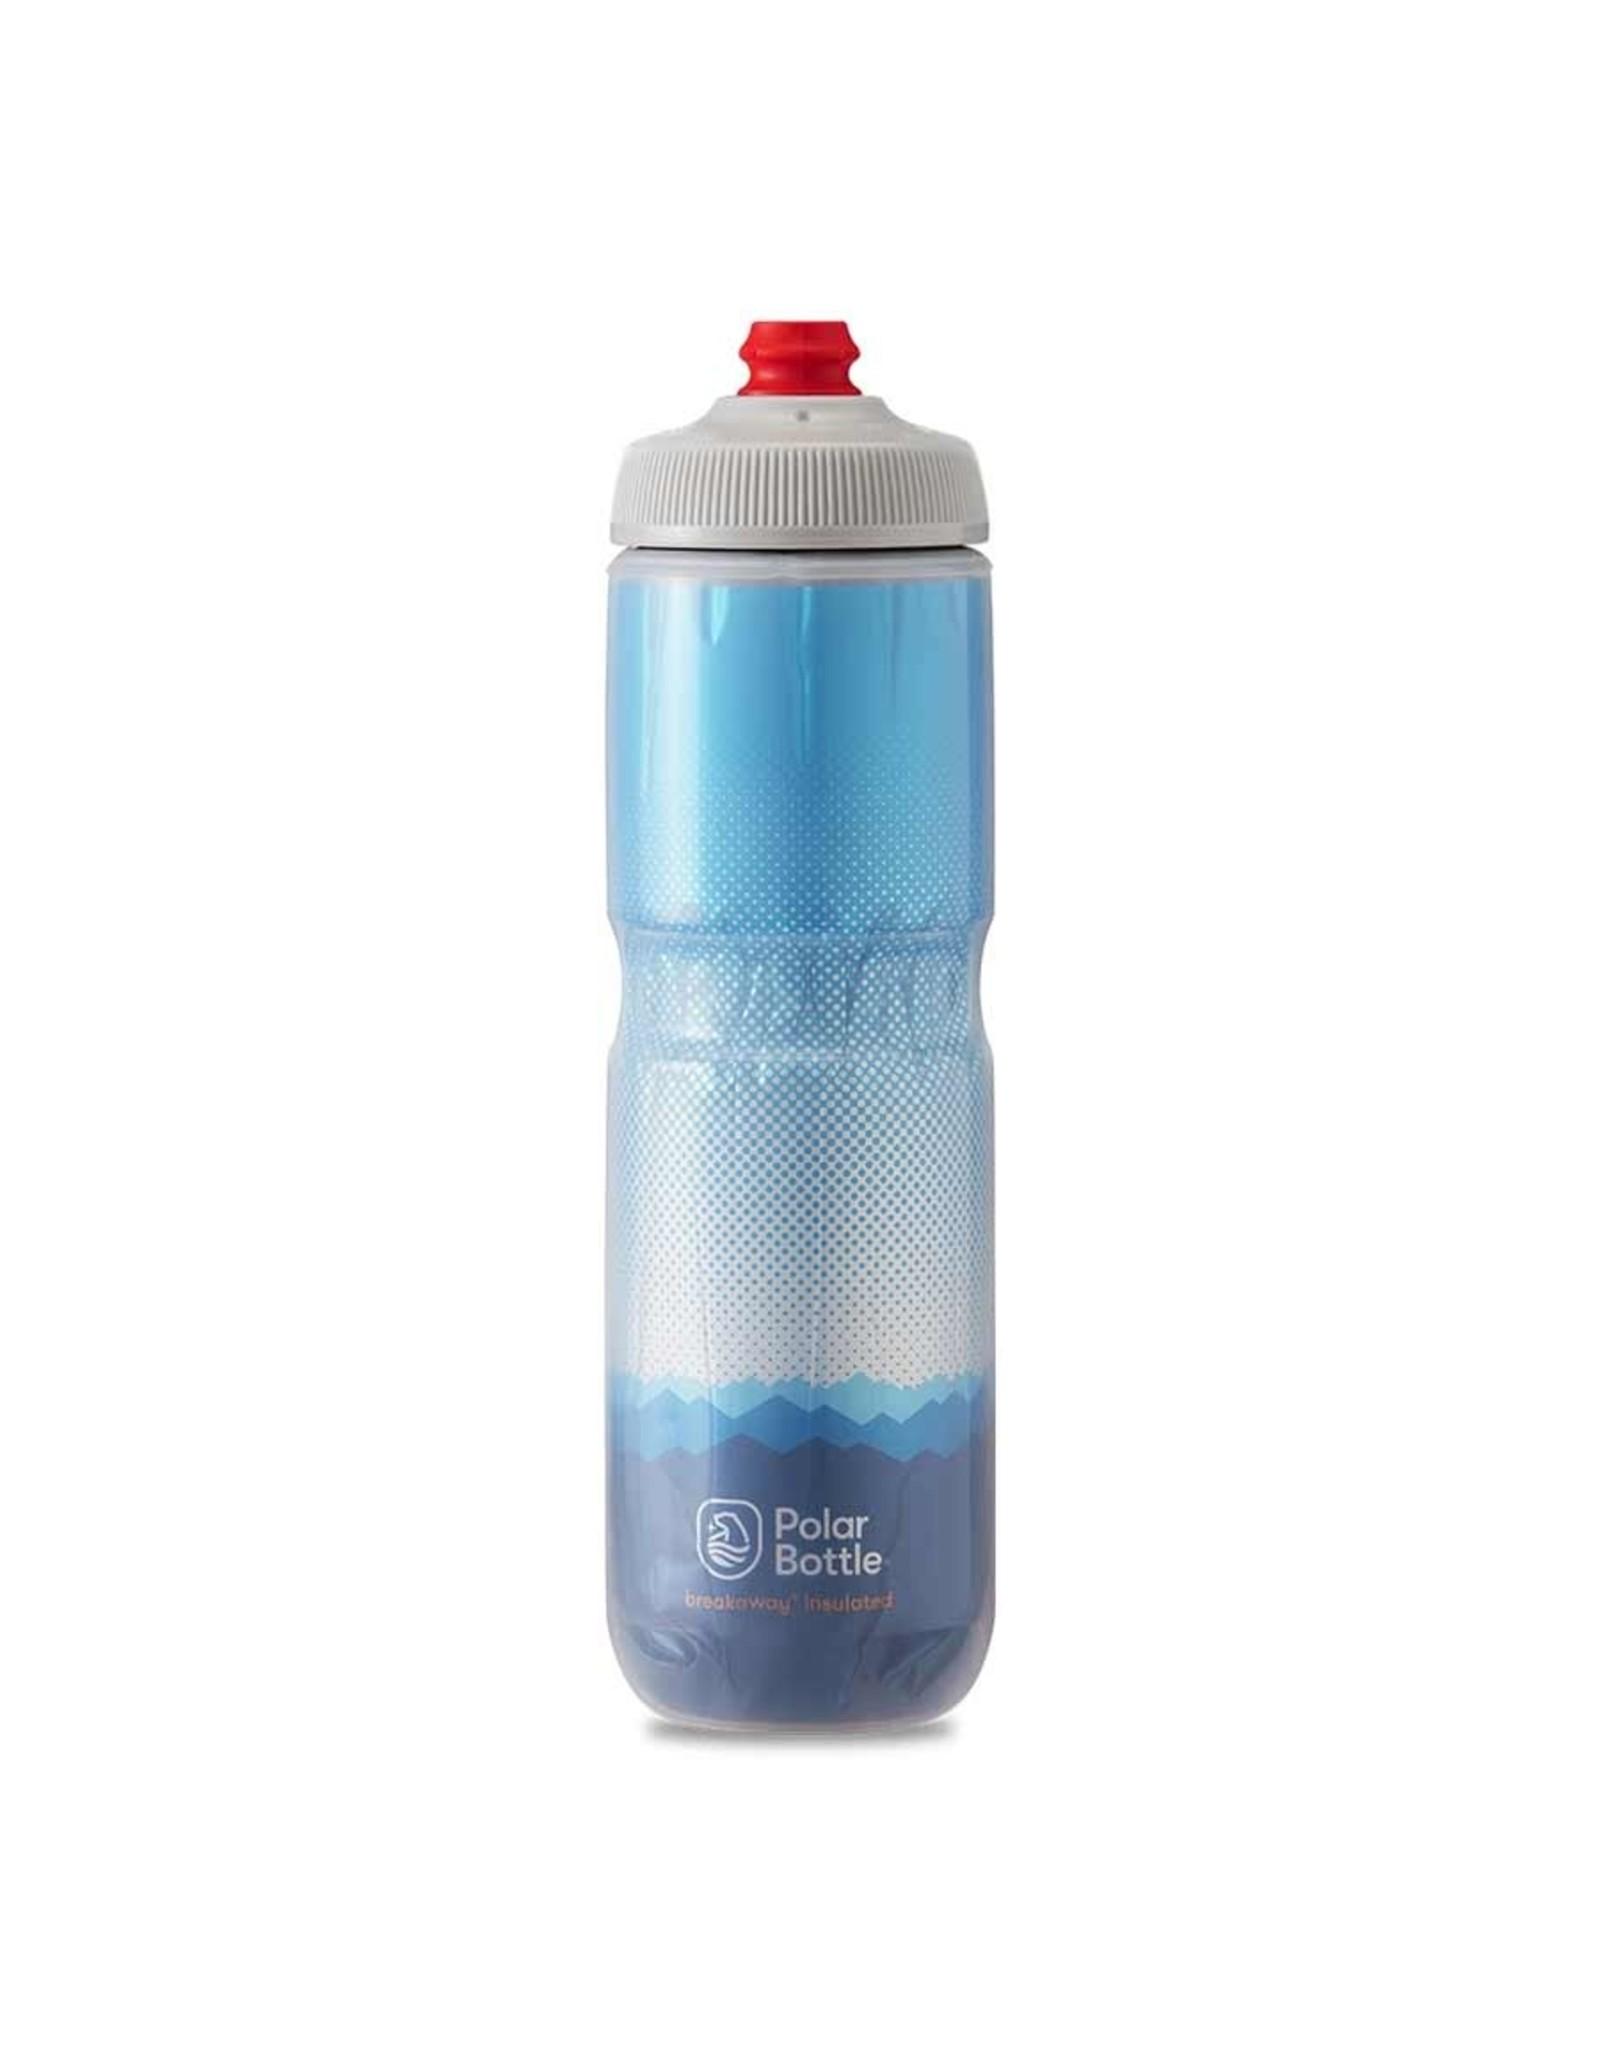 Polar Bottle Polar - Breakaway Insulated 24oz, Water Bottle, 710ml / 24oz, Cobalt Blue/Silver